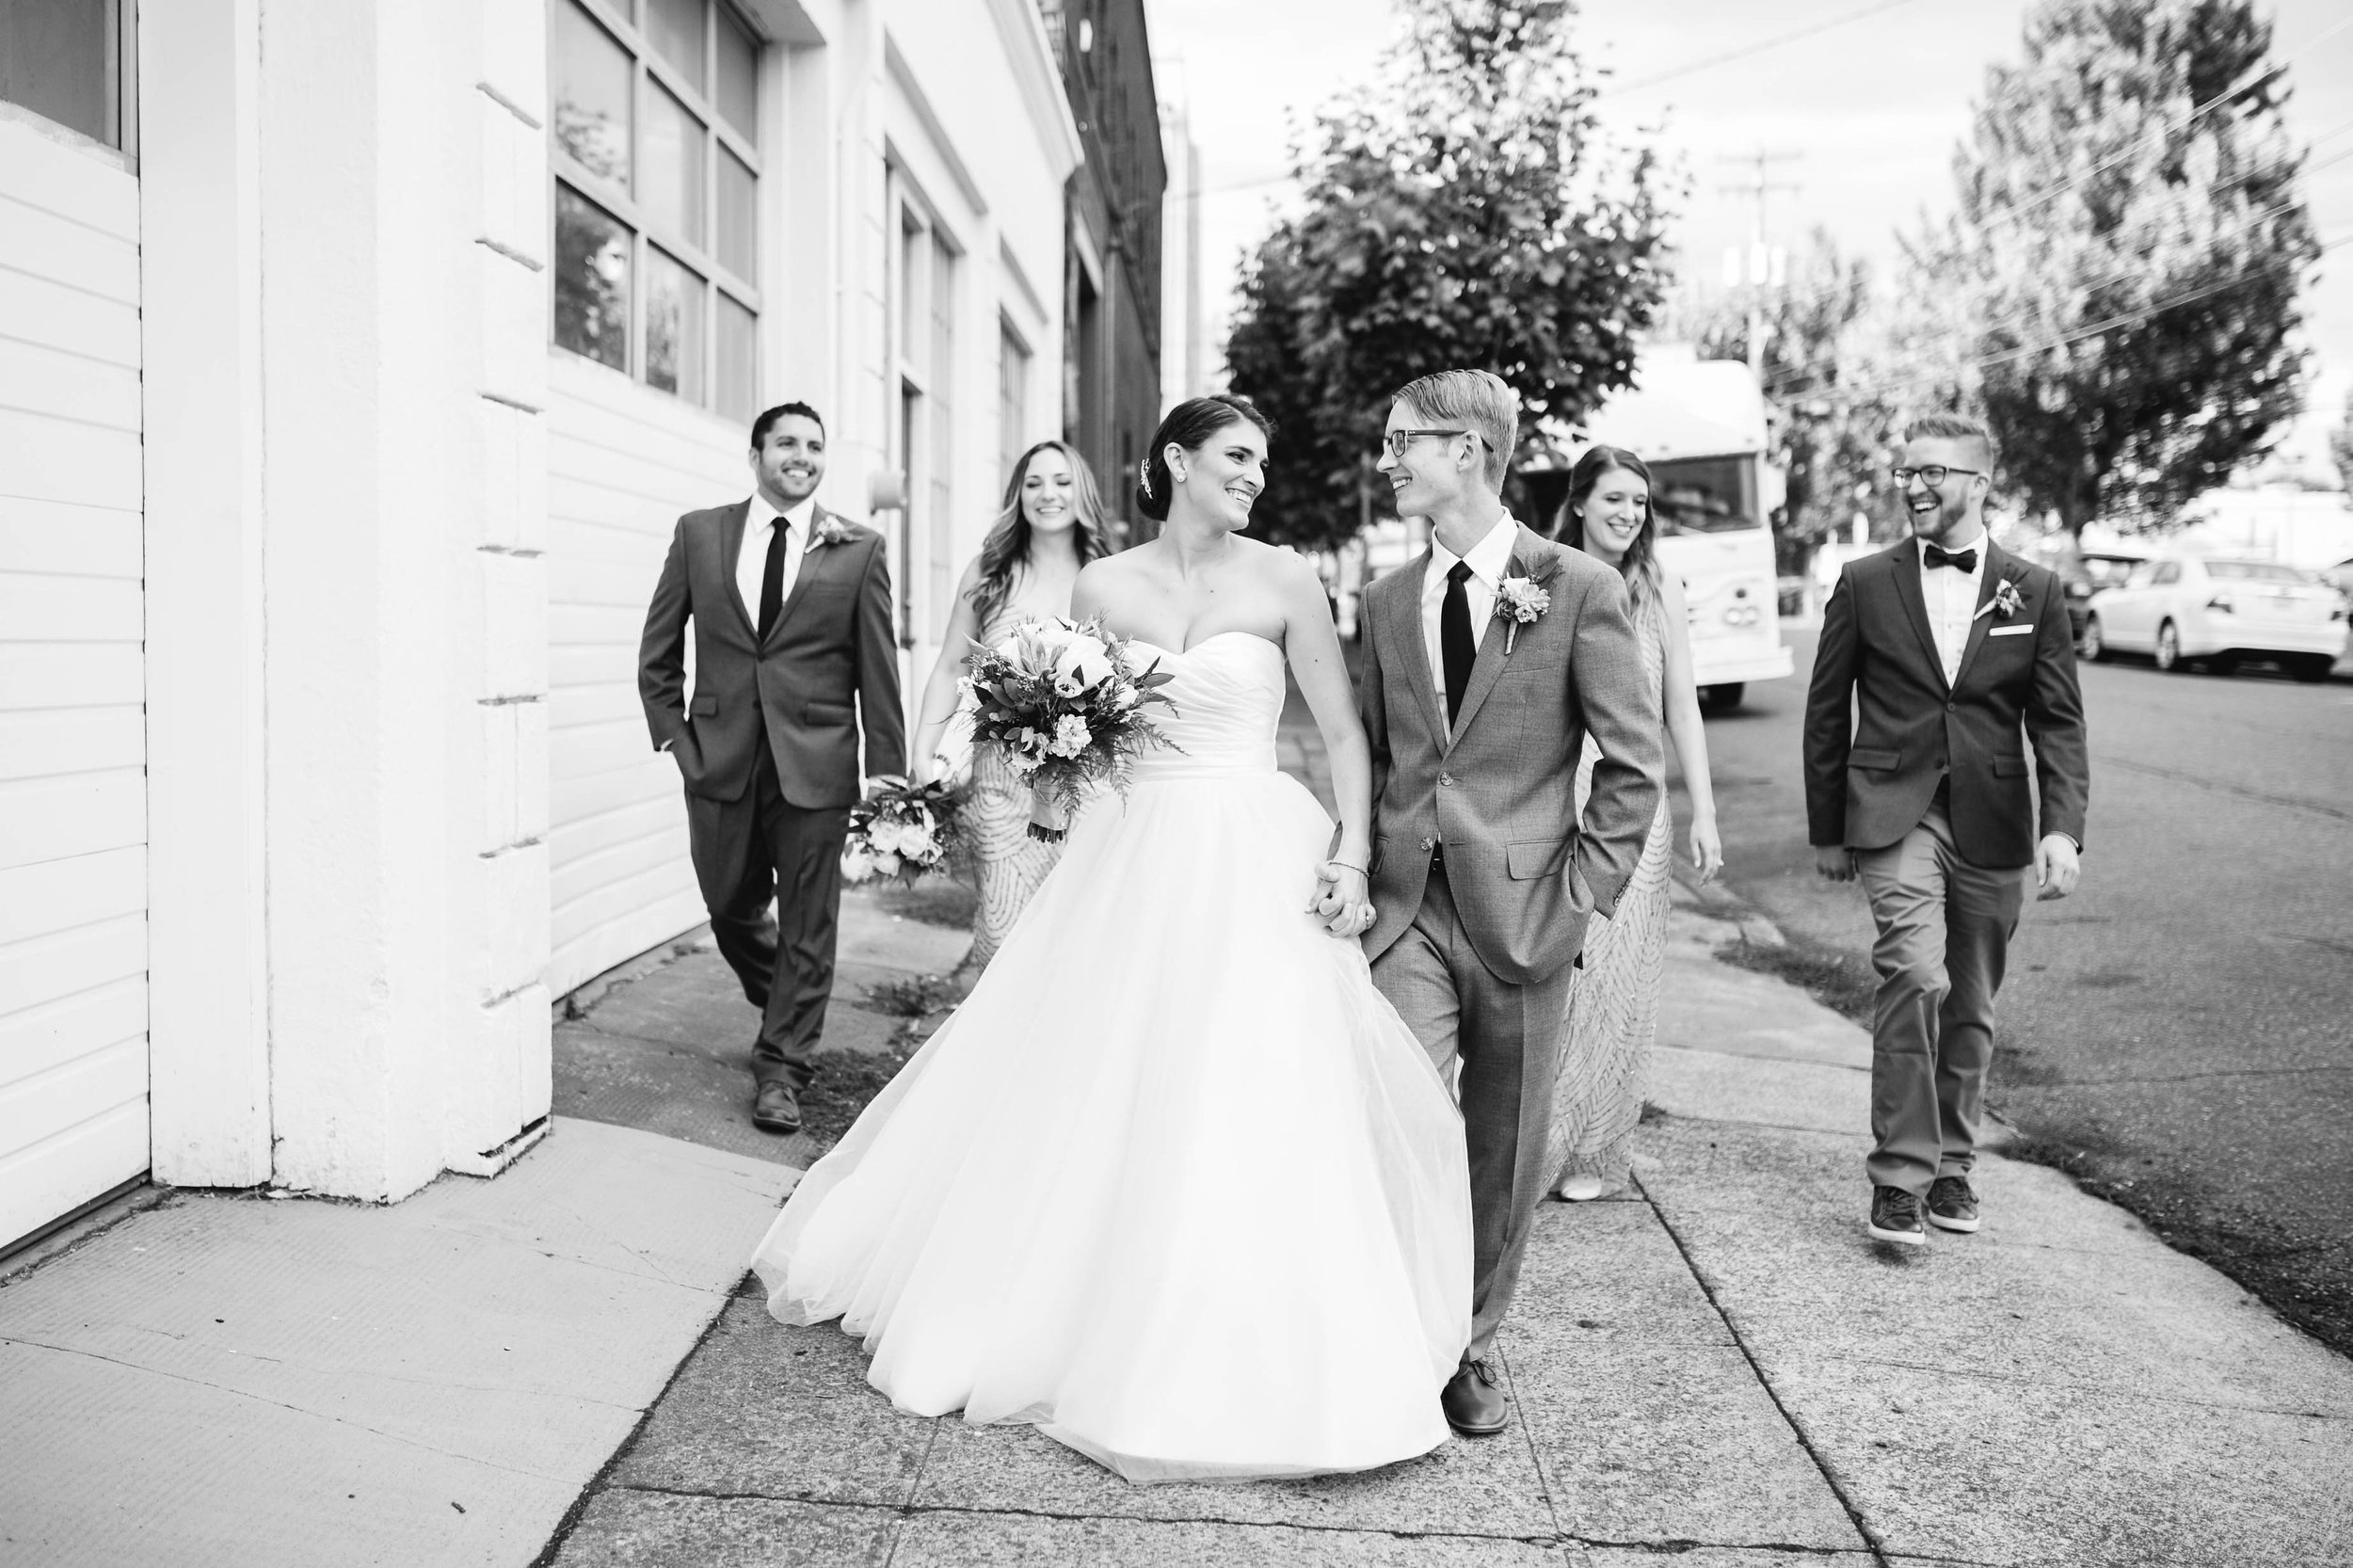 portland-wedding-venue6.jpg